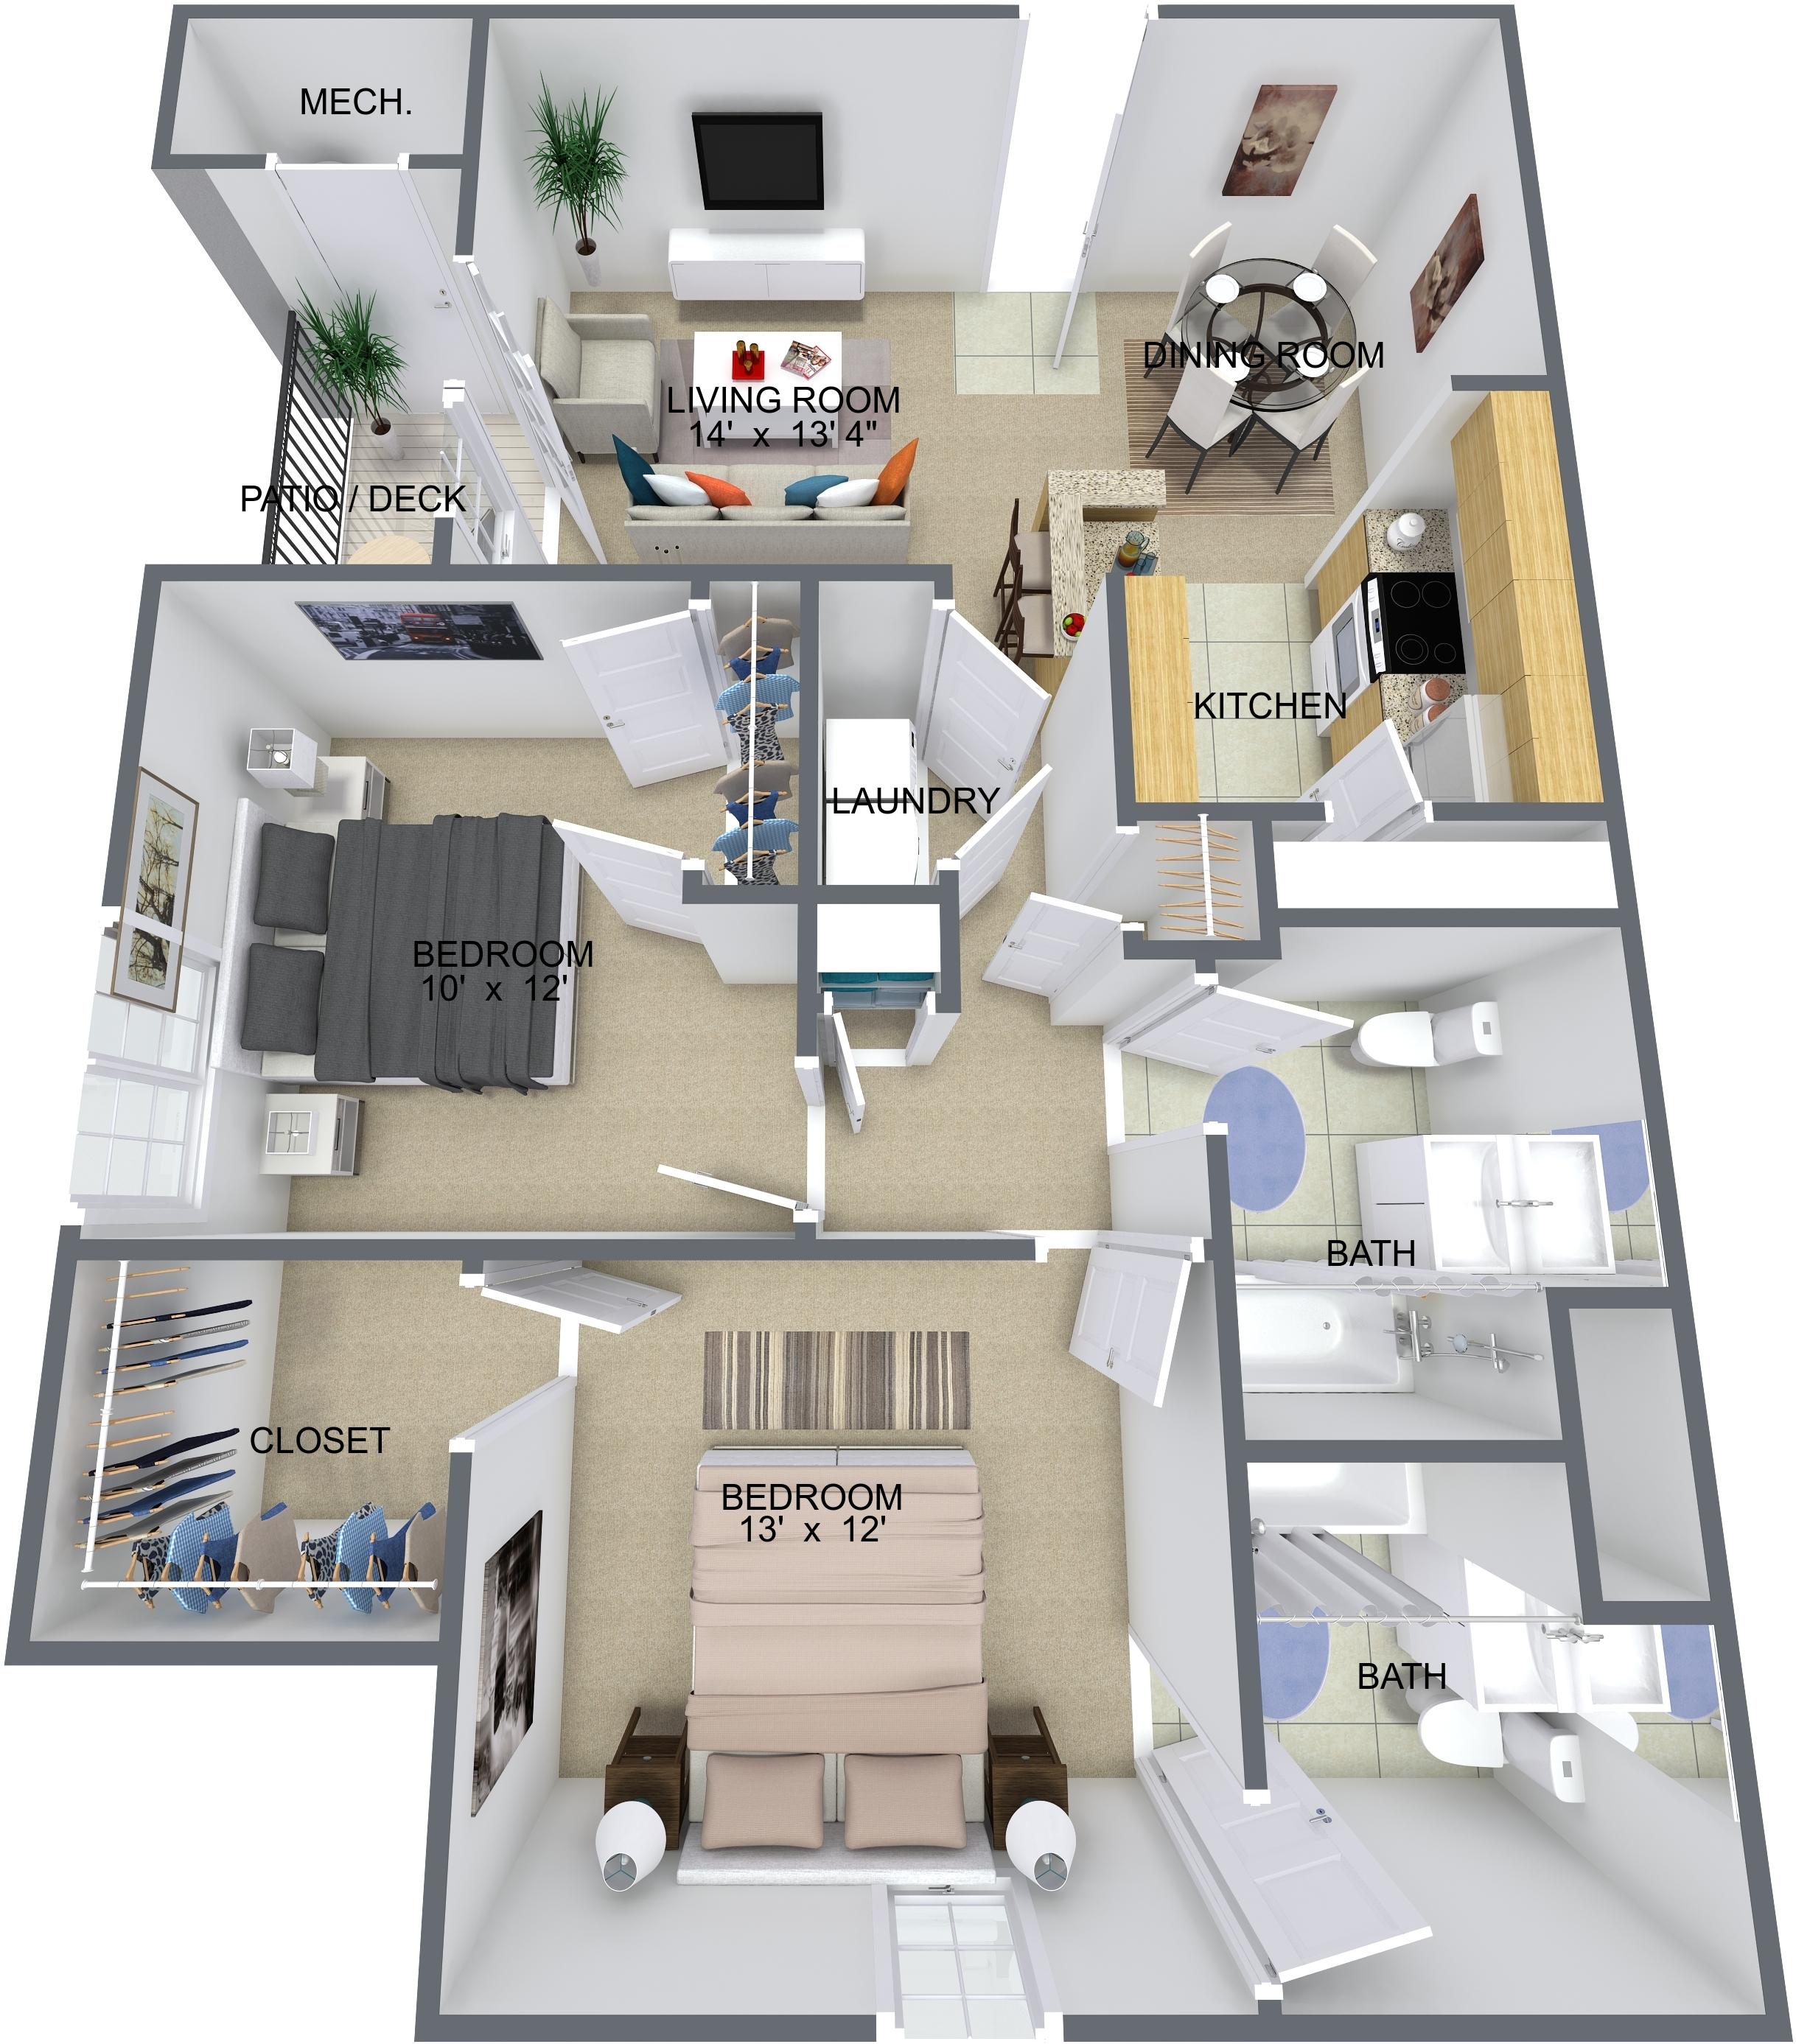 Floor Plans Forrest Landing Apartments For Rent In Newsport News Va